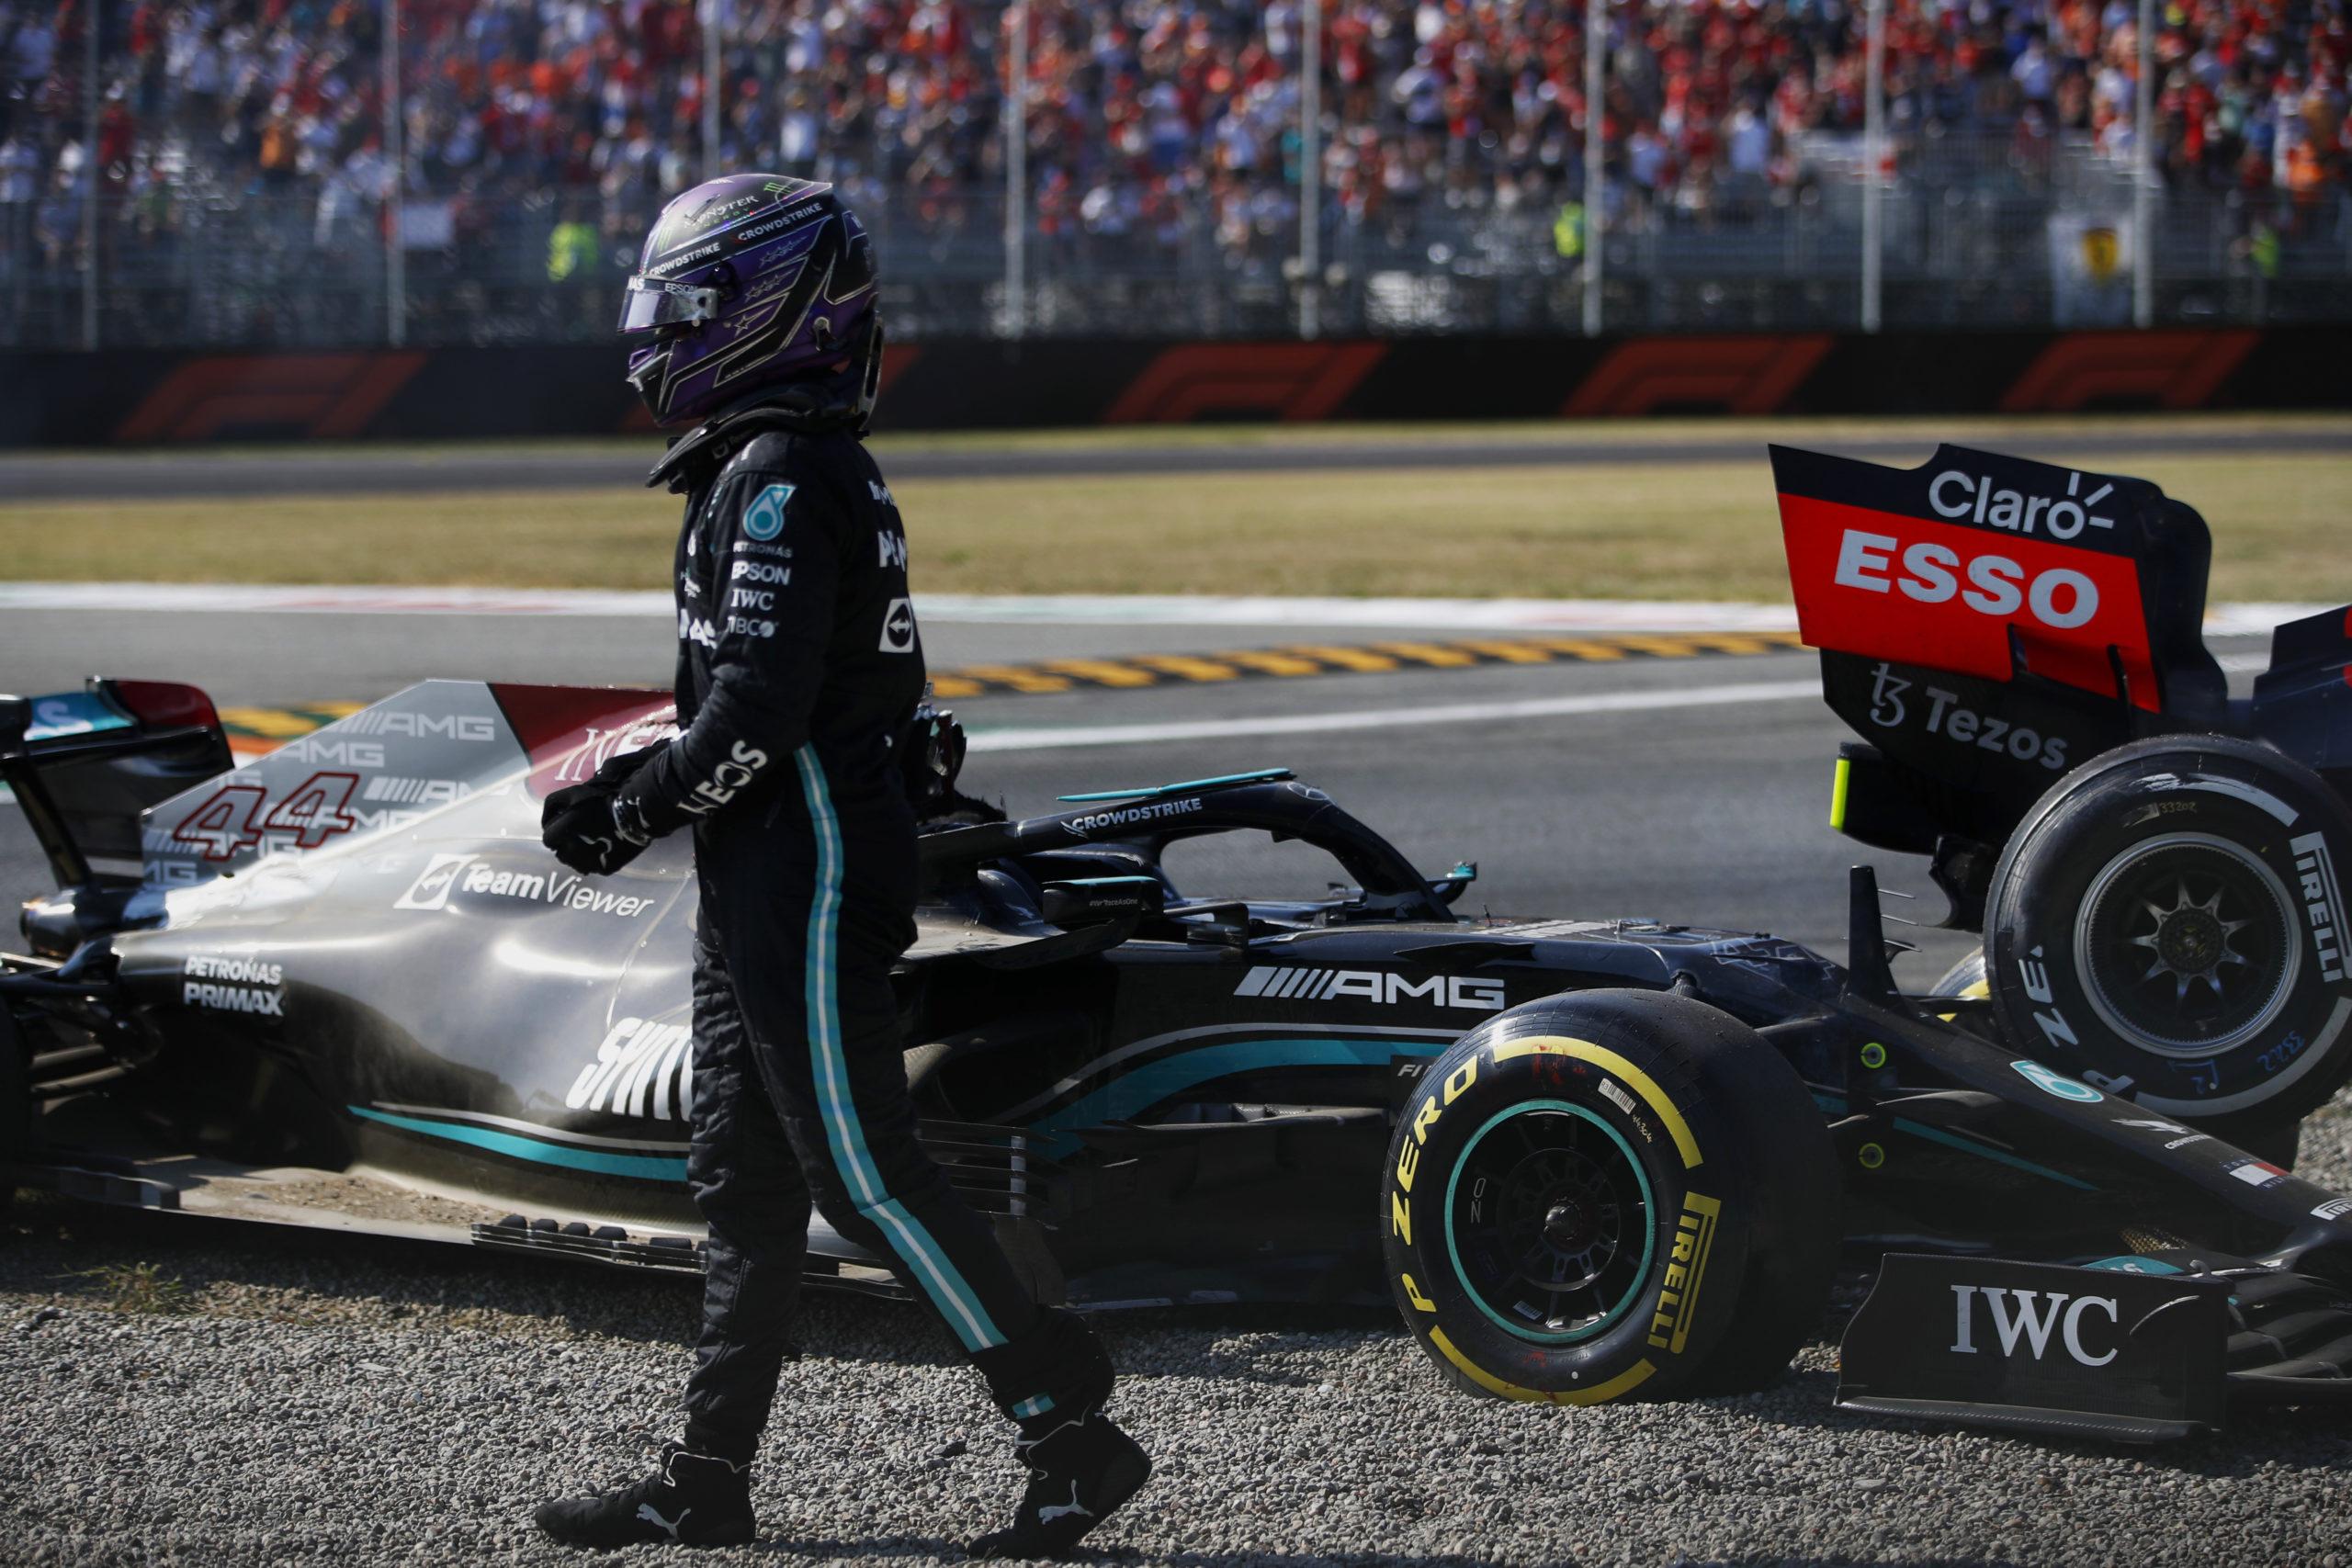 Lewis Hamilton, Mercedes, 2021 Italian Grand Prix, Sunday - LAT Images